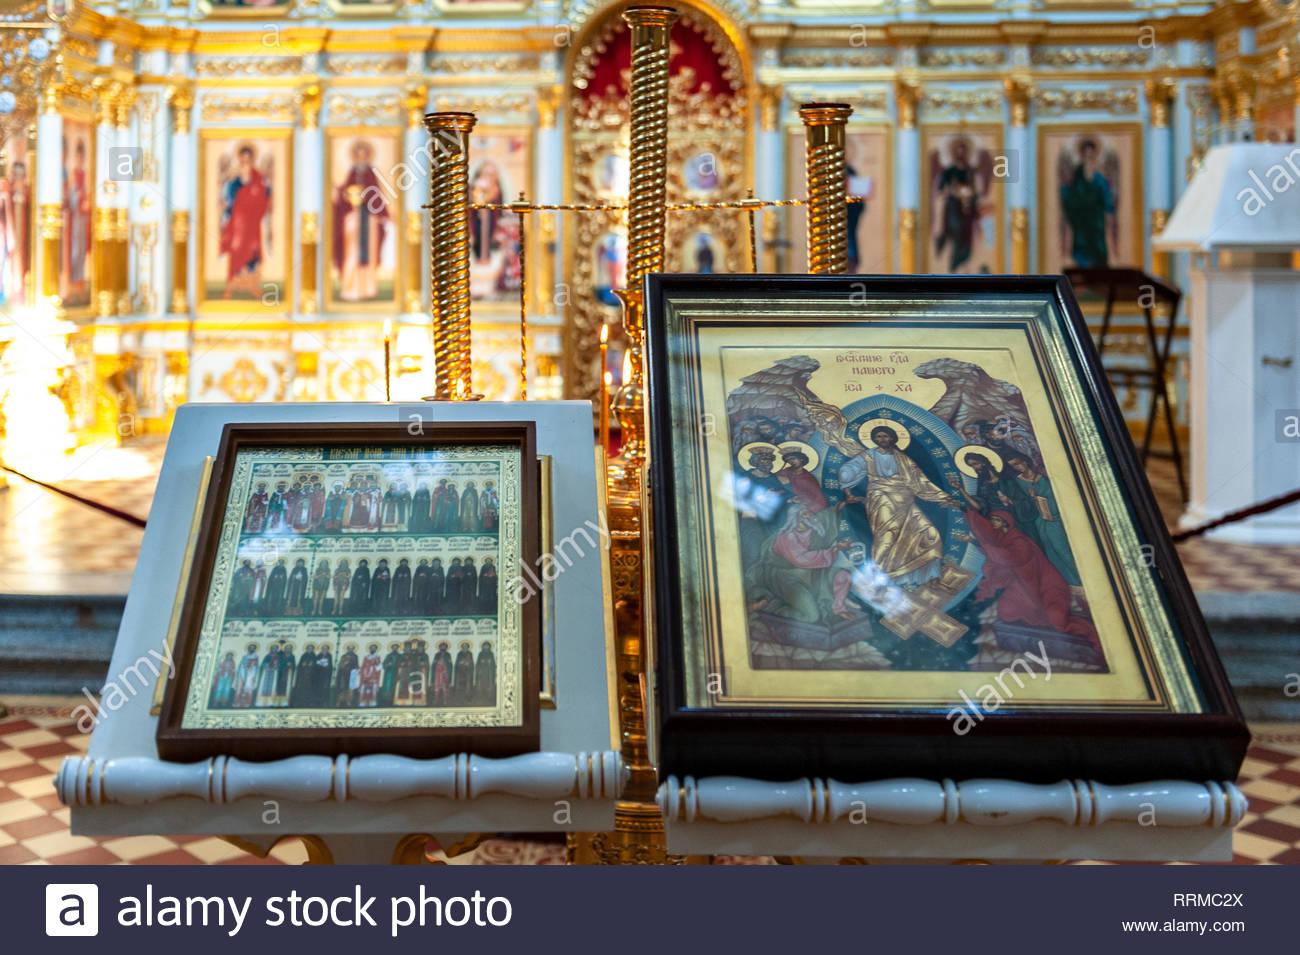 Church Mother of God Joy of All Who Sorrow interior,Sviyazshk,Russia - Stock Image